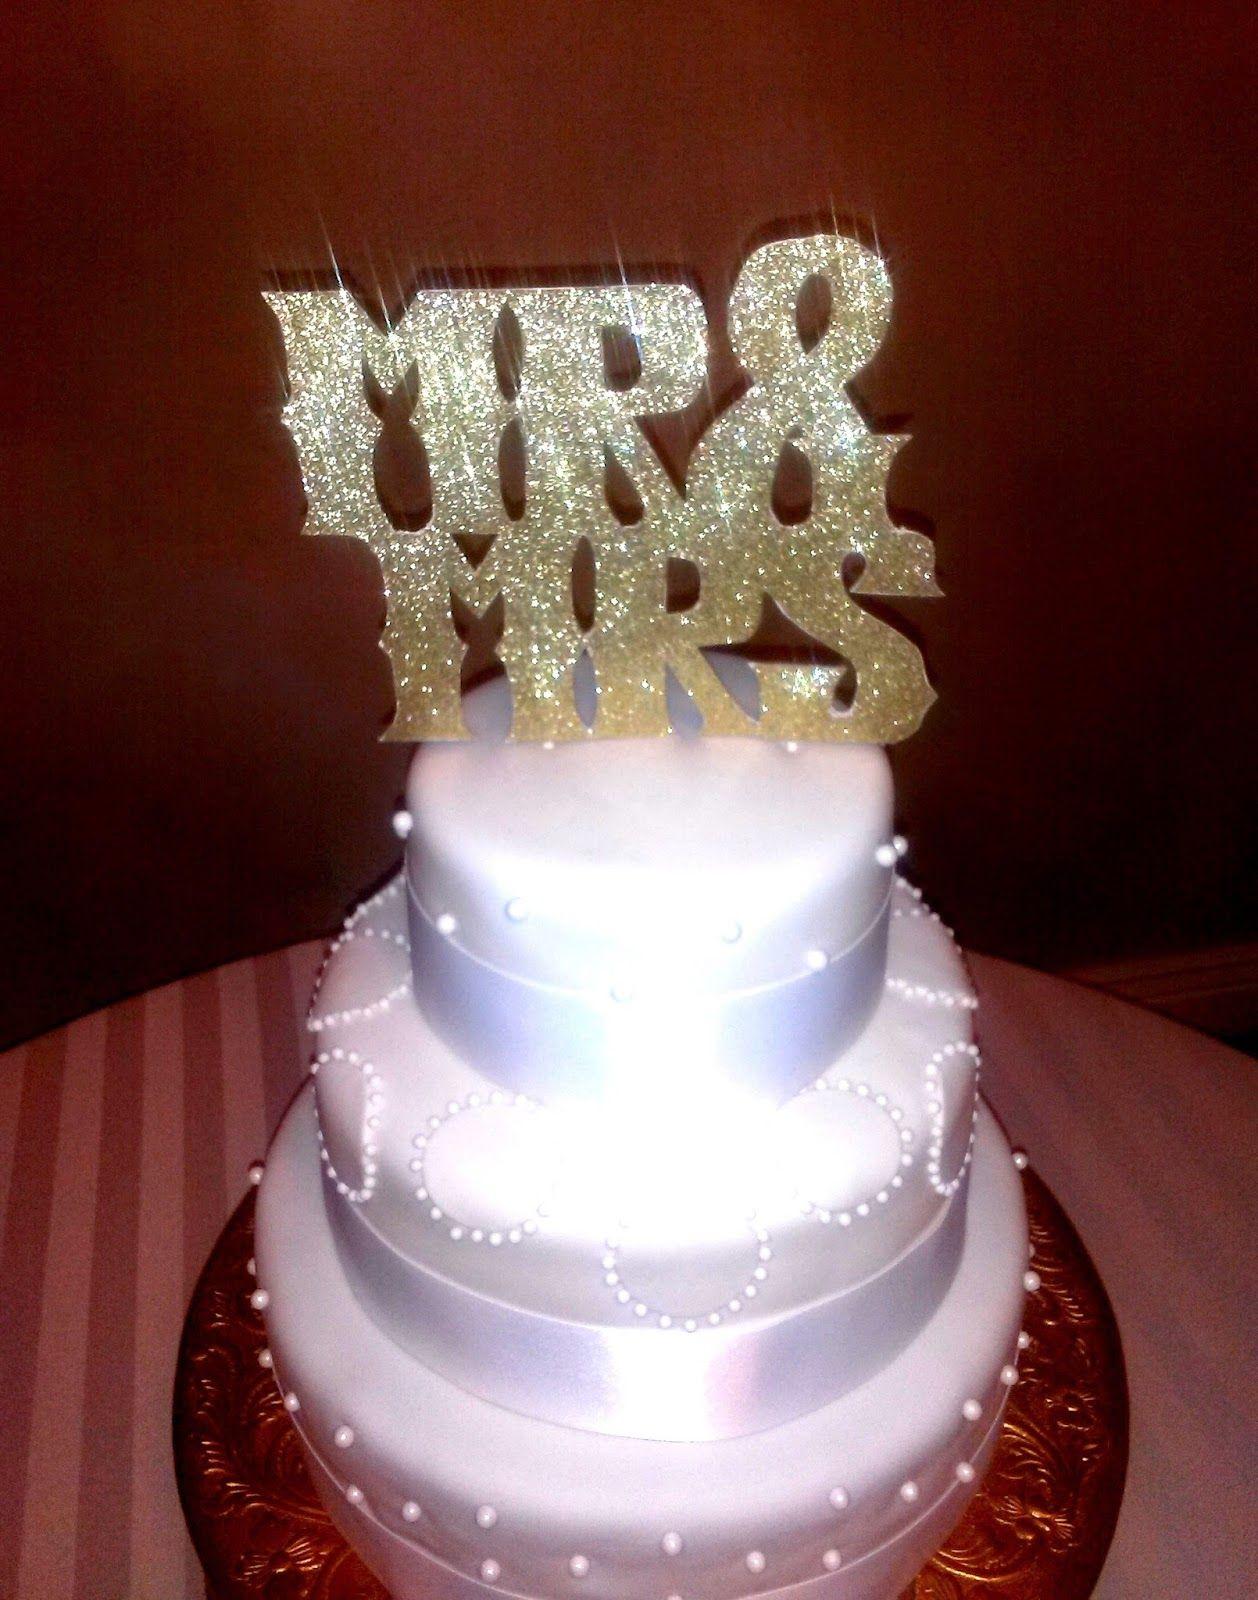 Devanys designs winter white and gold wedding cake with mr u mrs